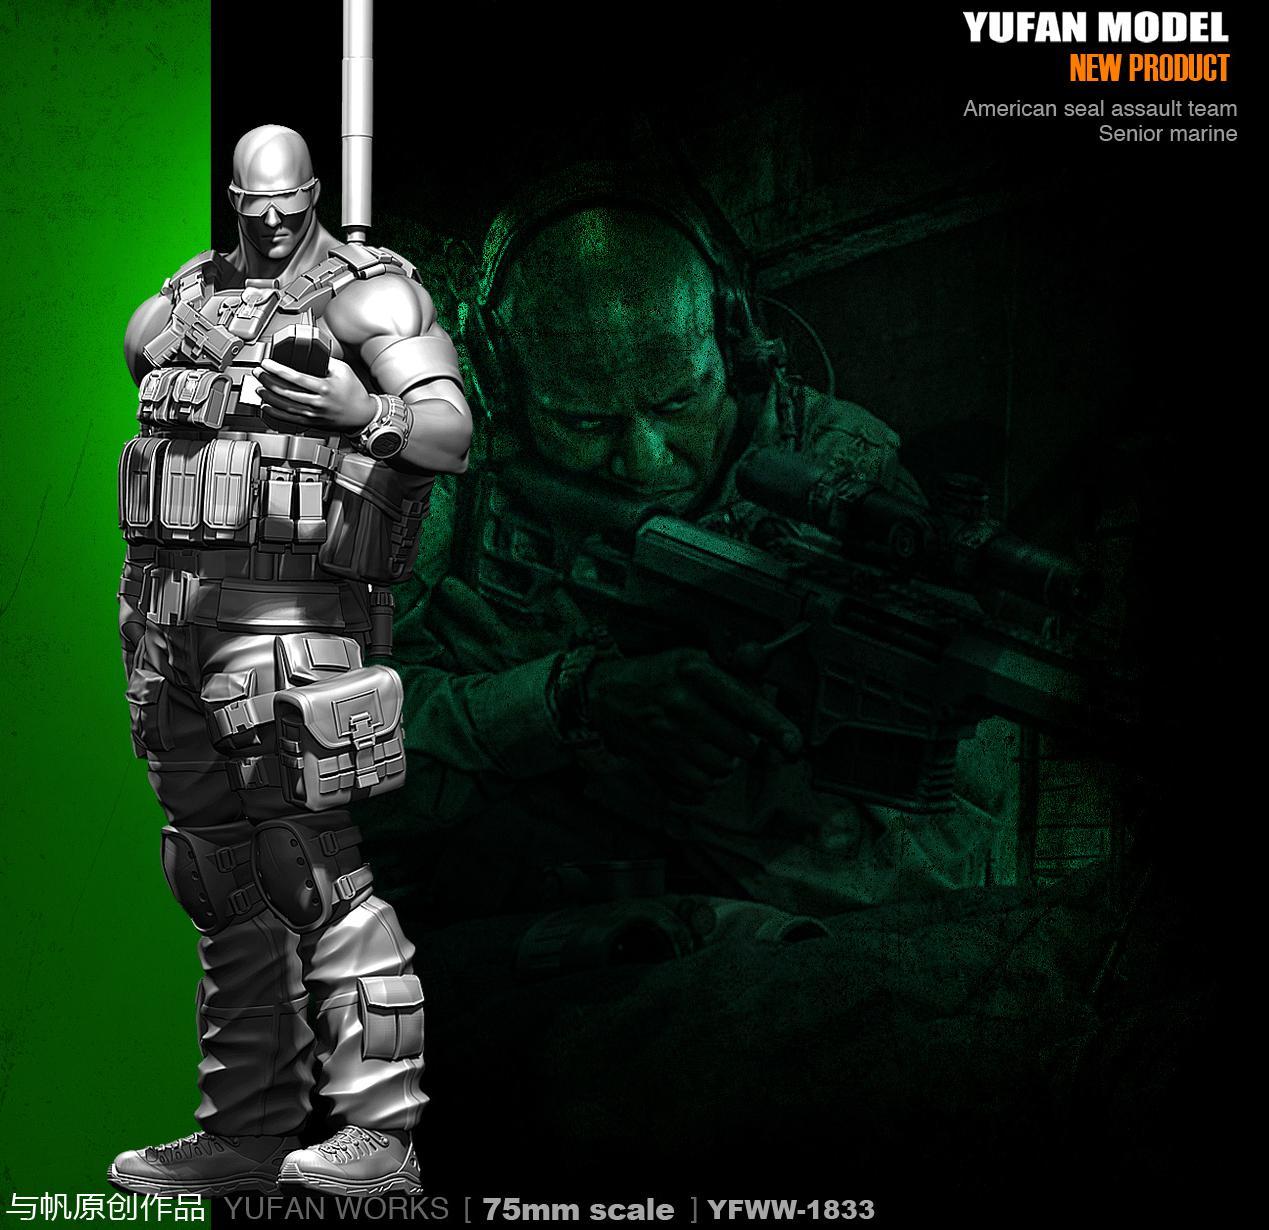 Yufan modelo 1/35 Kit de figuras en miniatura de YFWW35-1833 de soldado de resina de francotirador